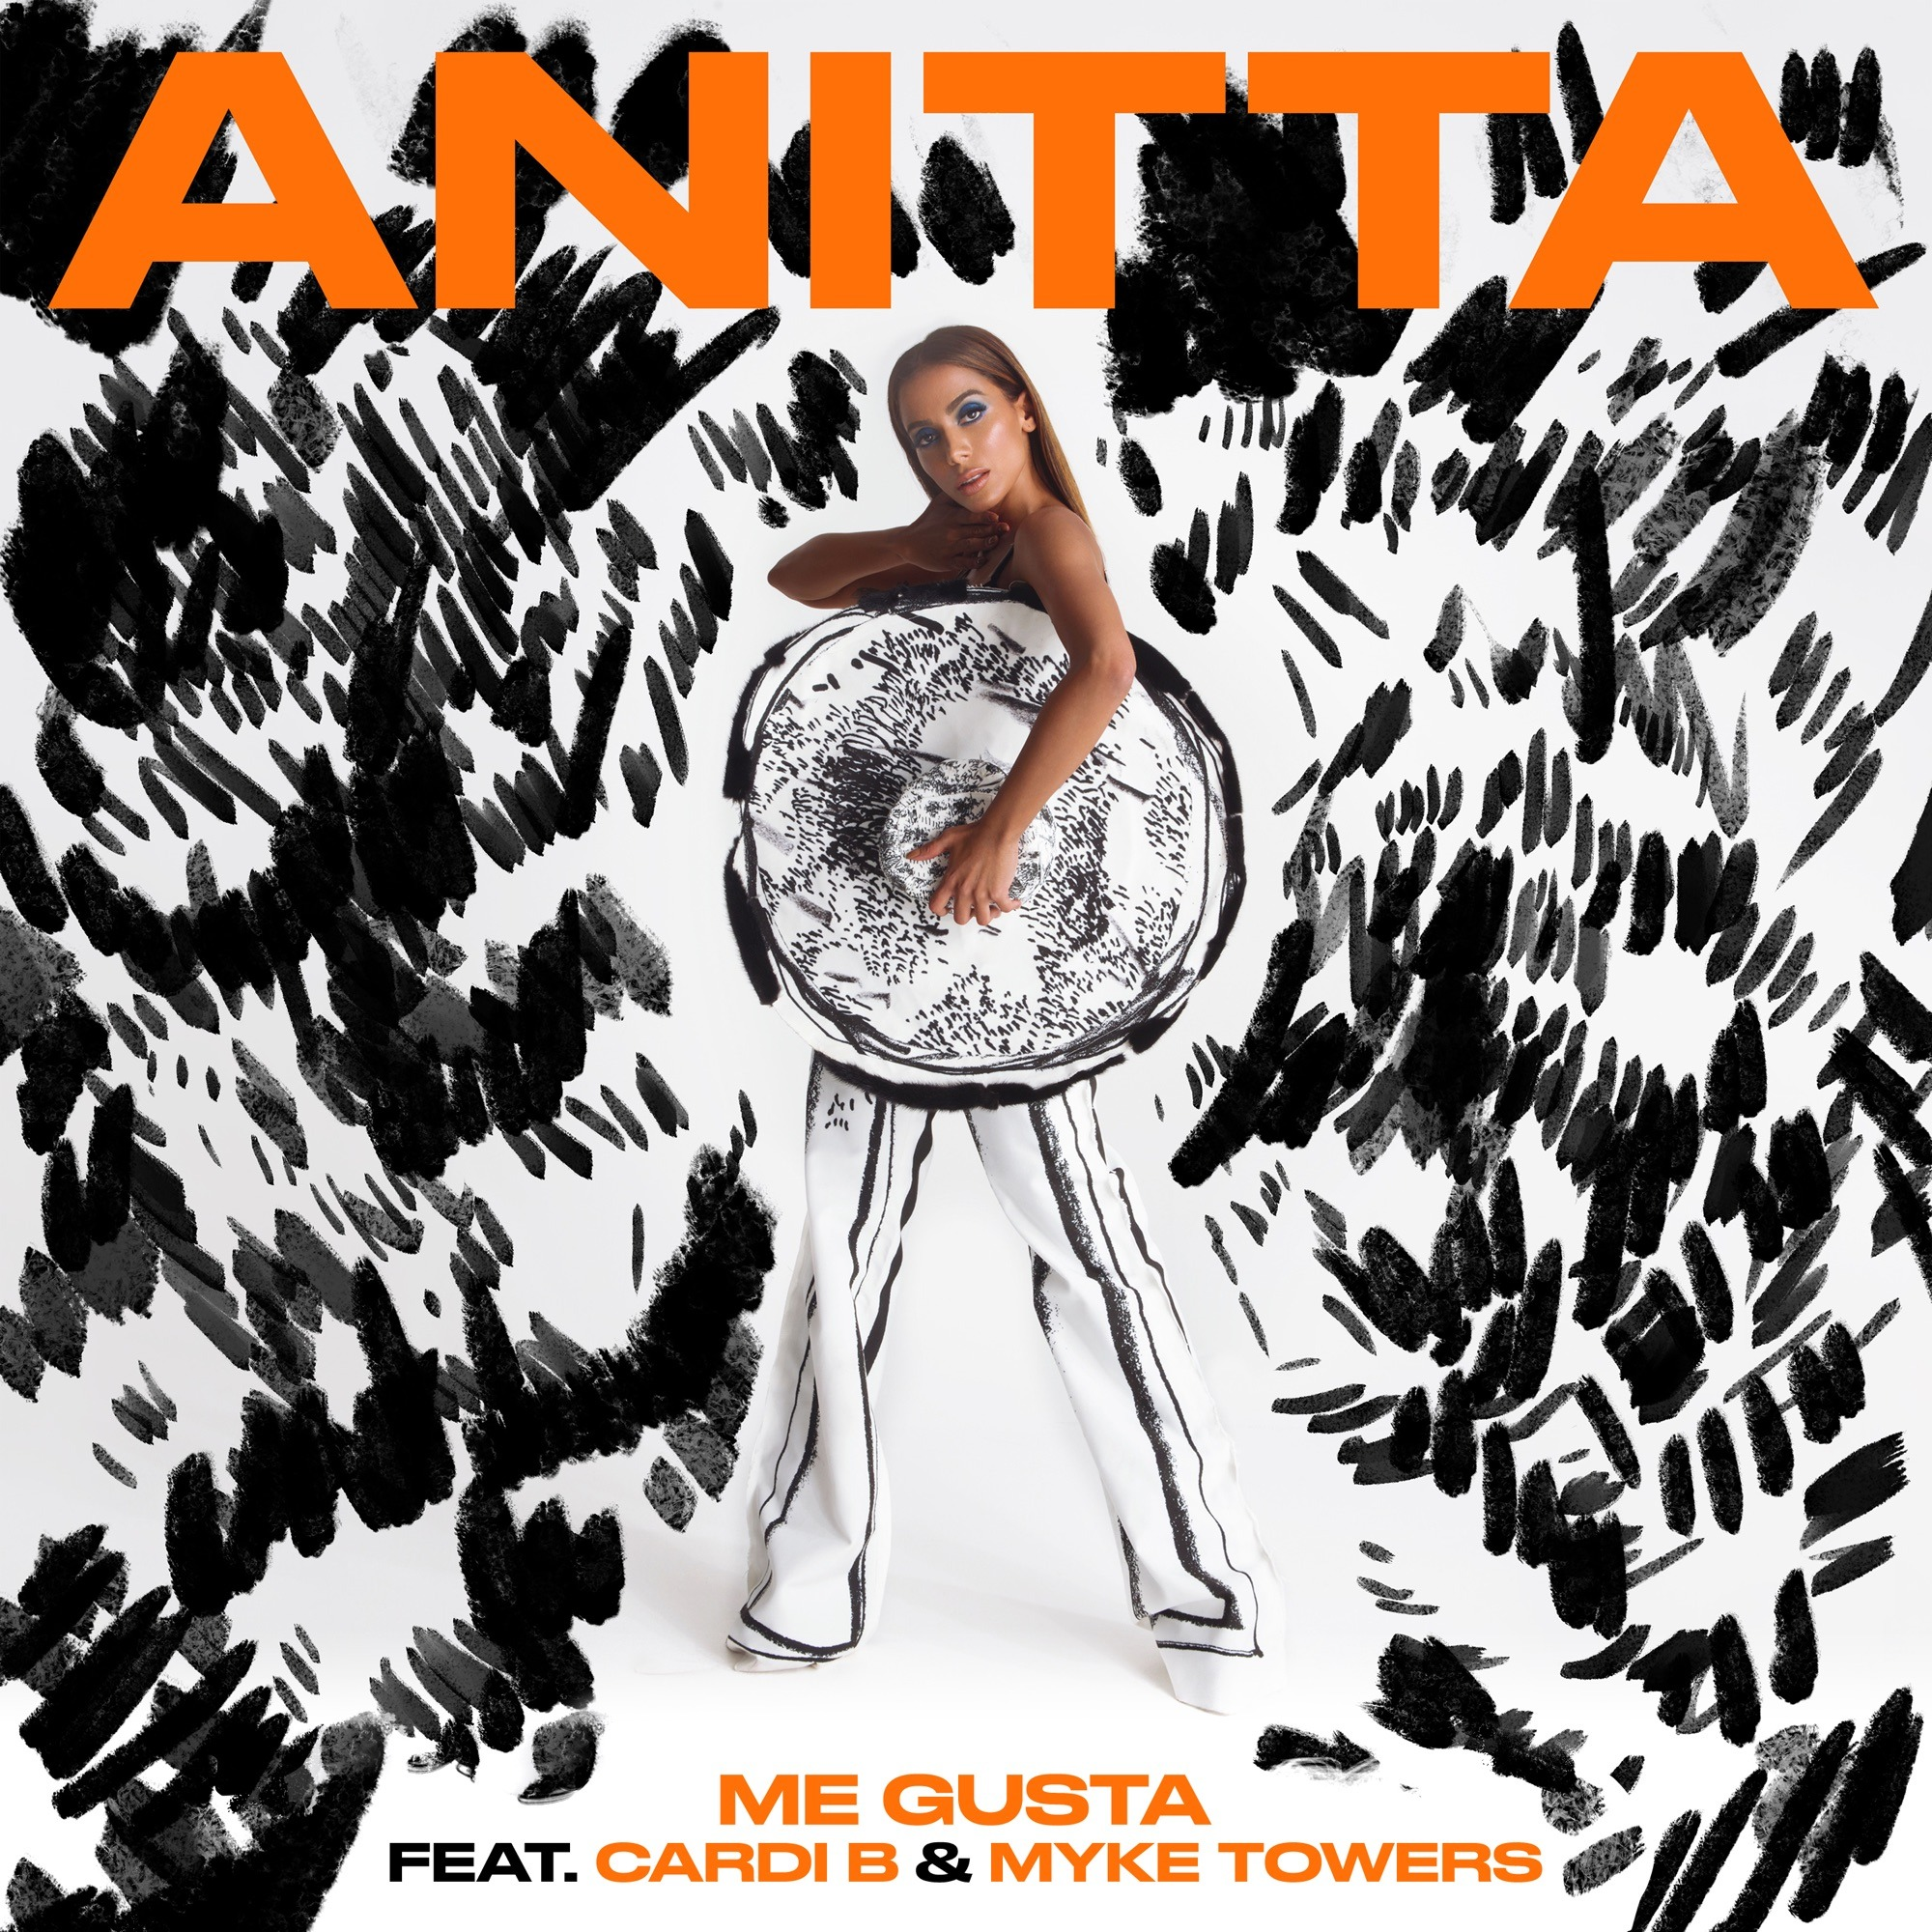 Anitta Ft. Cardi B & Myke Towers - Me Gusta